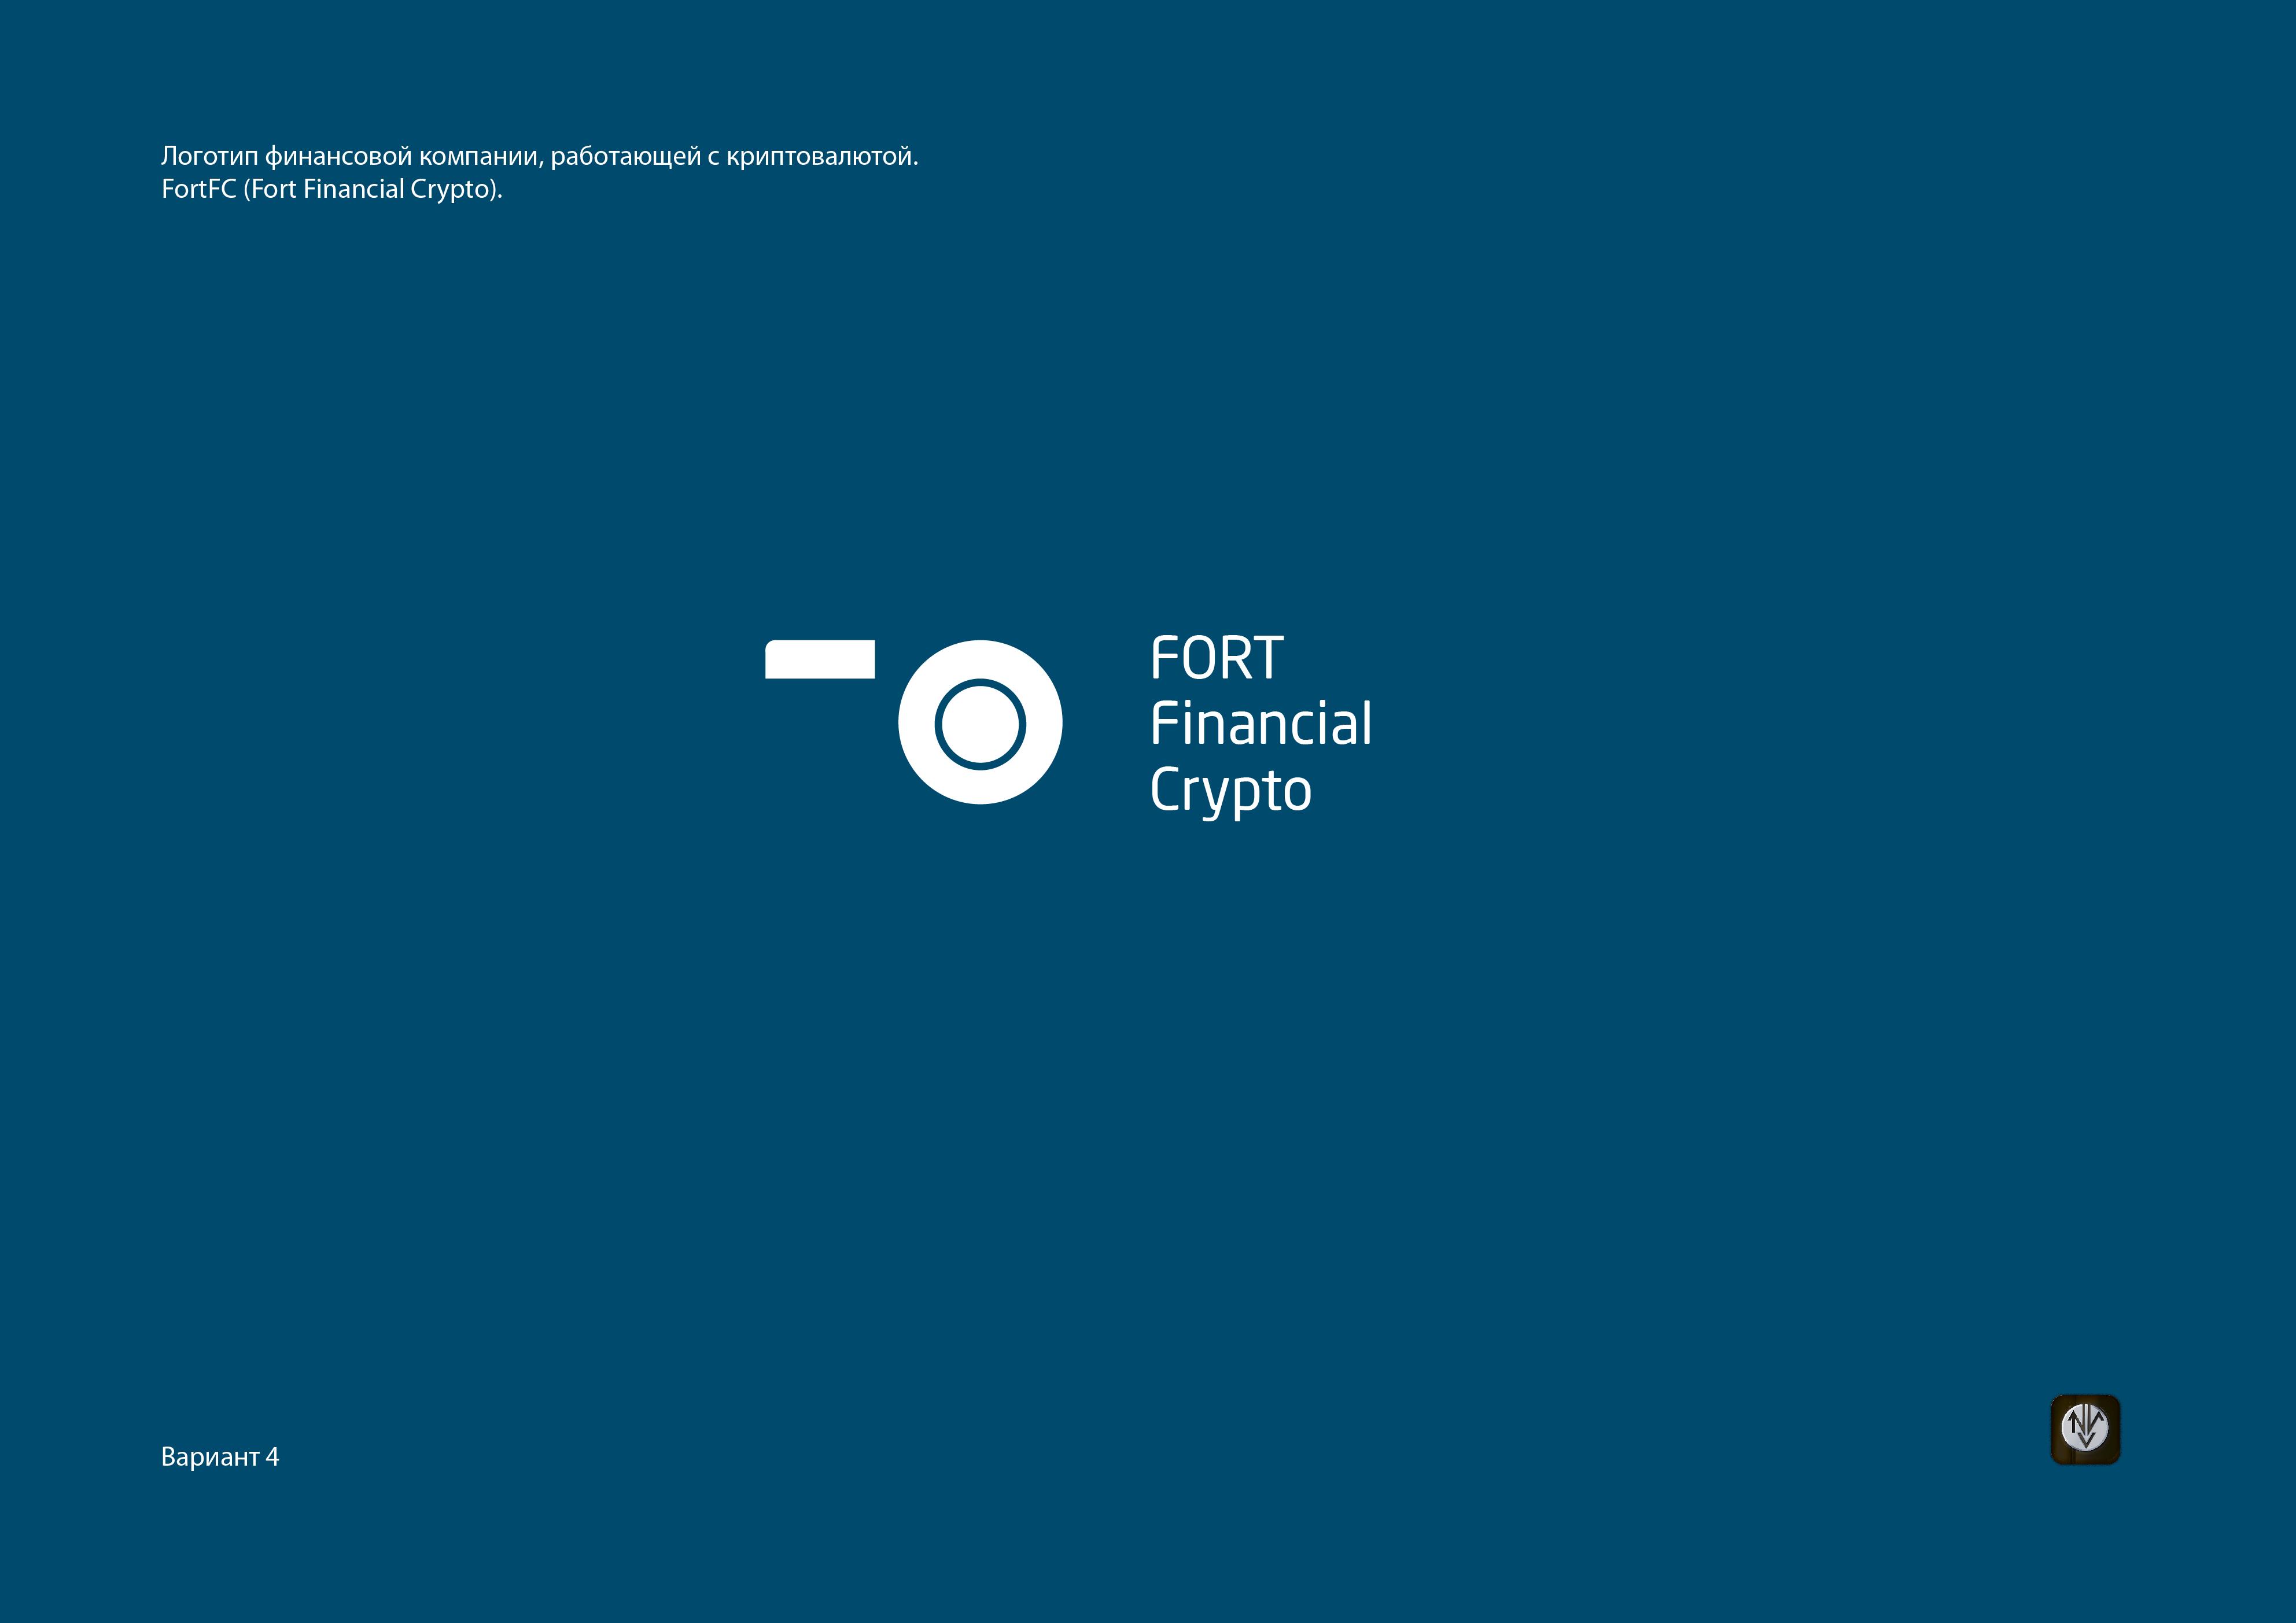 Разработка логотипа финансовой компании фото f_2925a888d10cef32.png